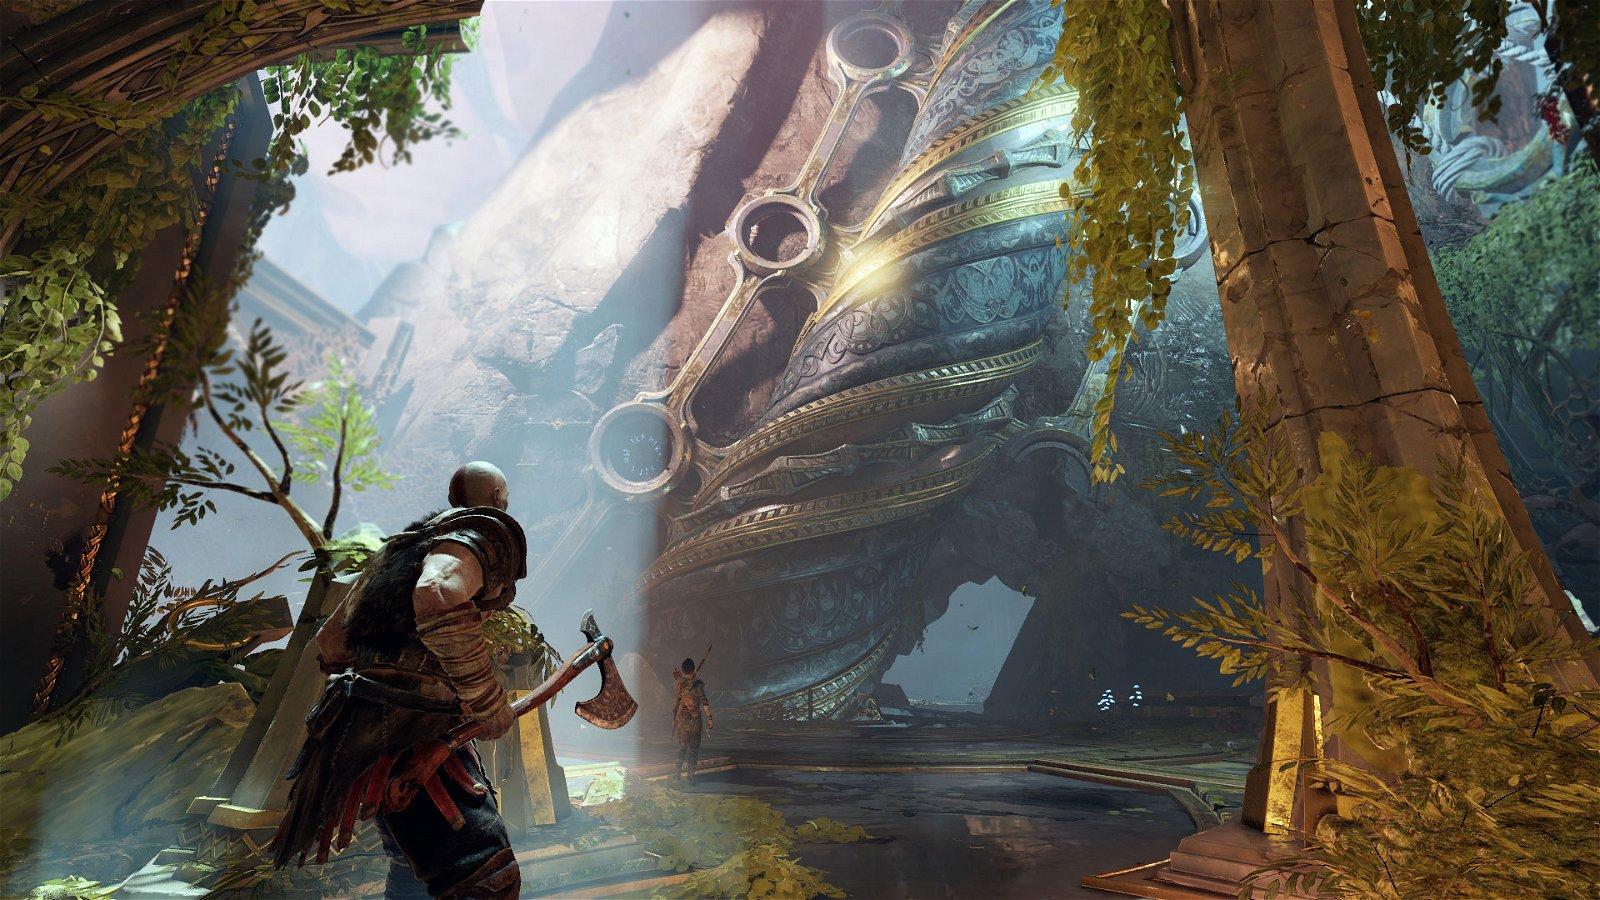 God of war review kratos is back - God of war wallpaper for ps4 ...